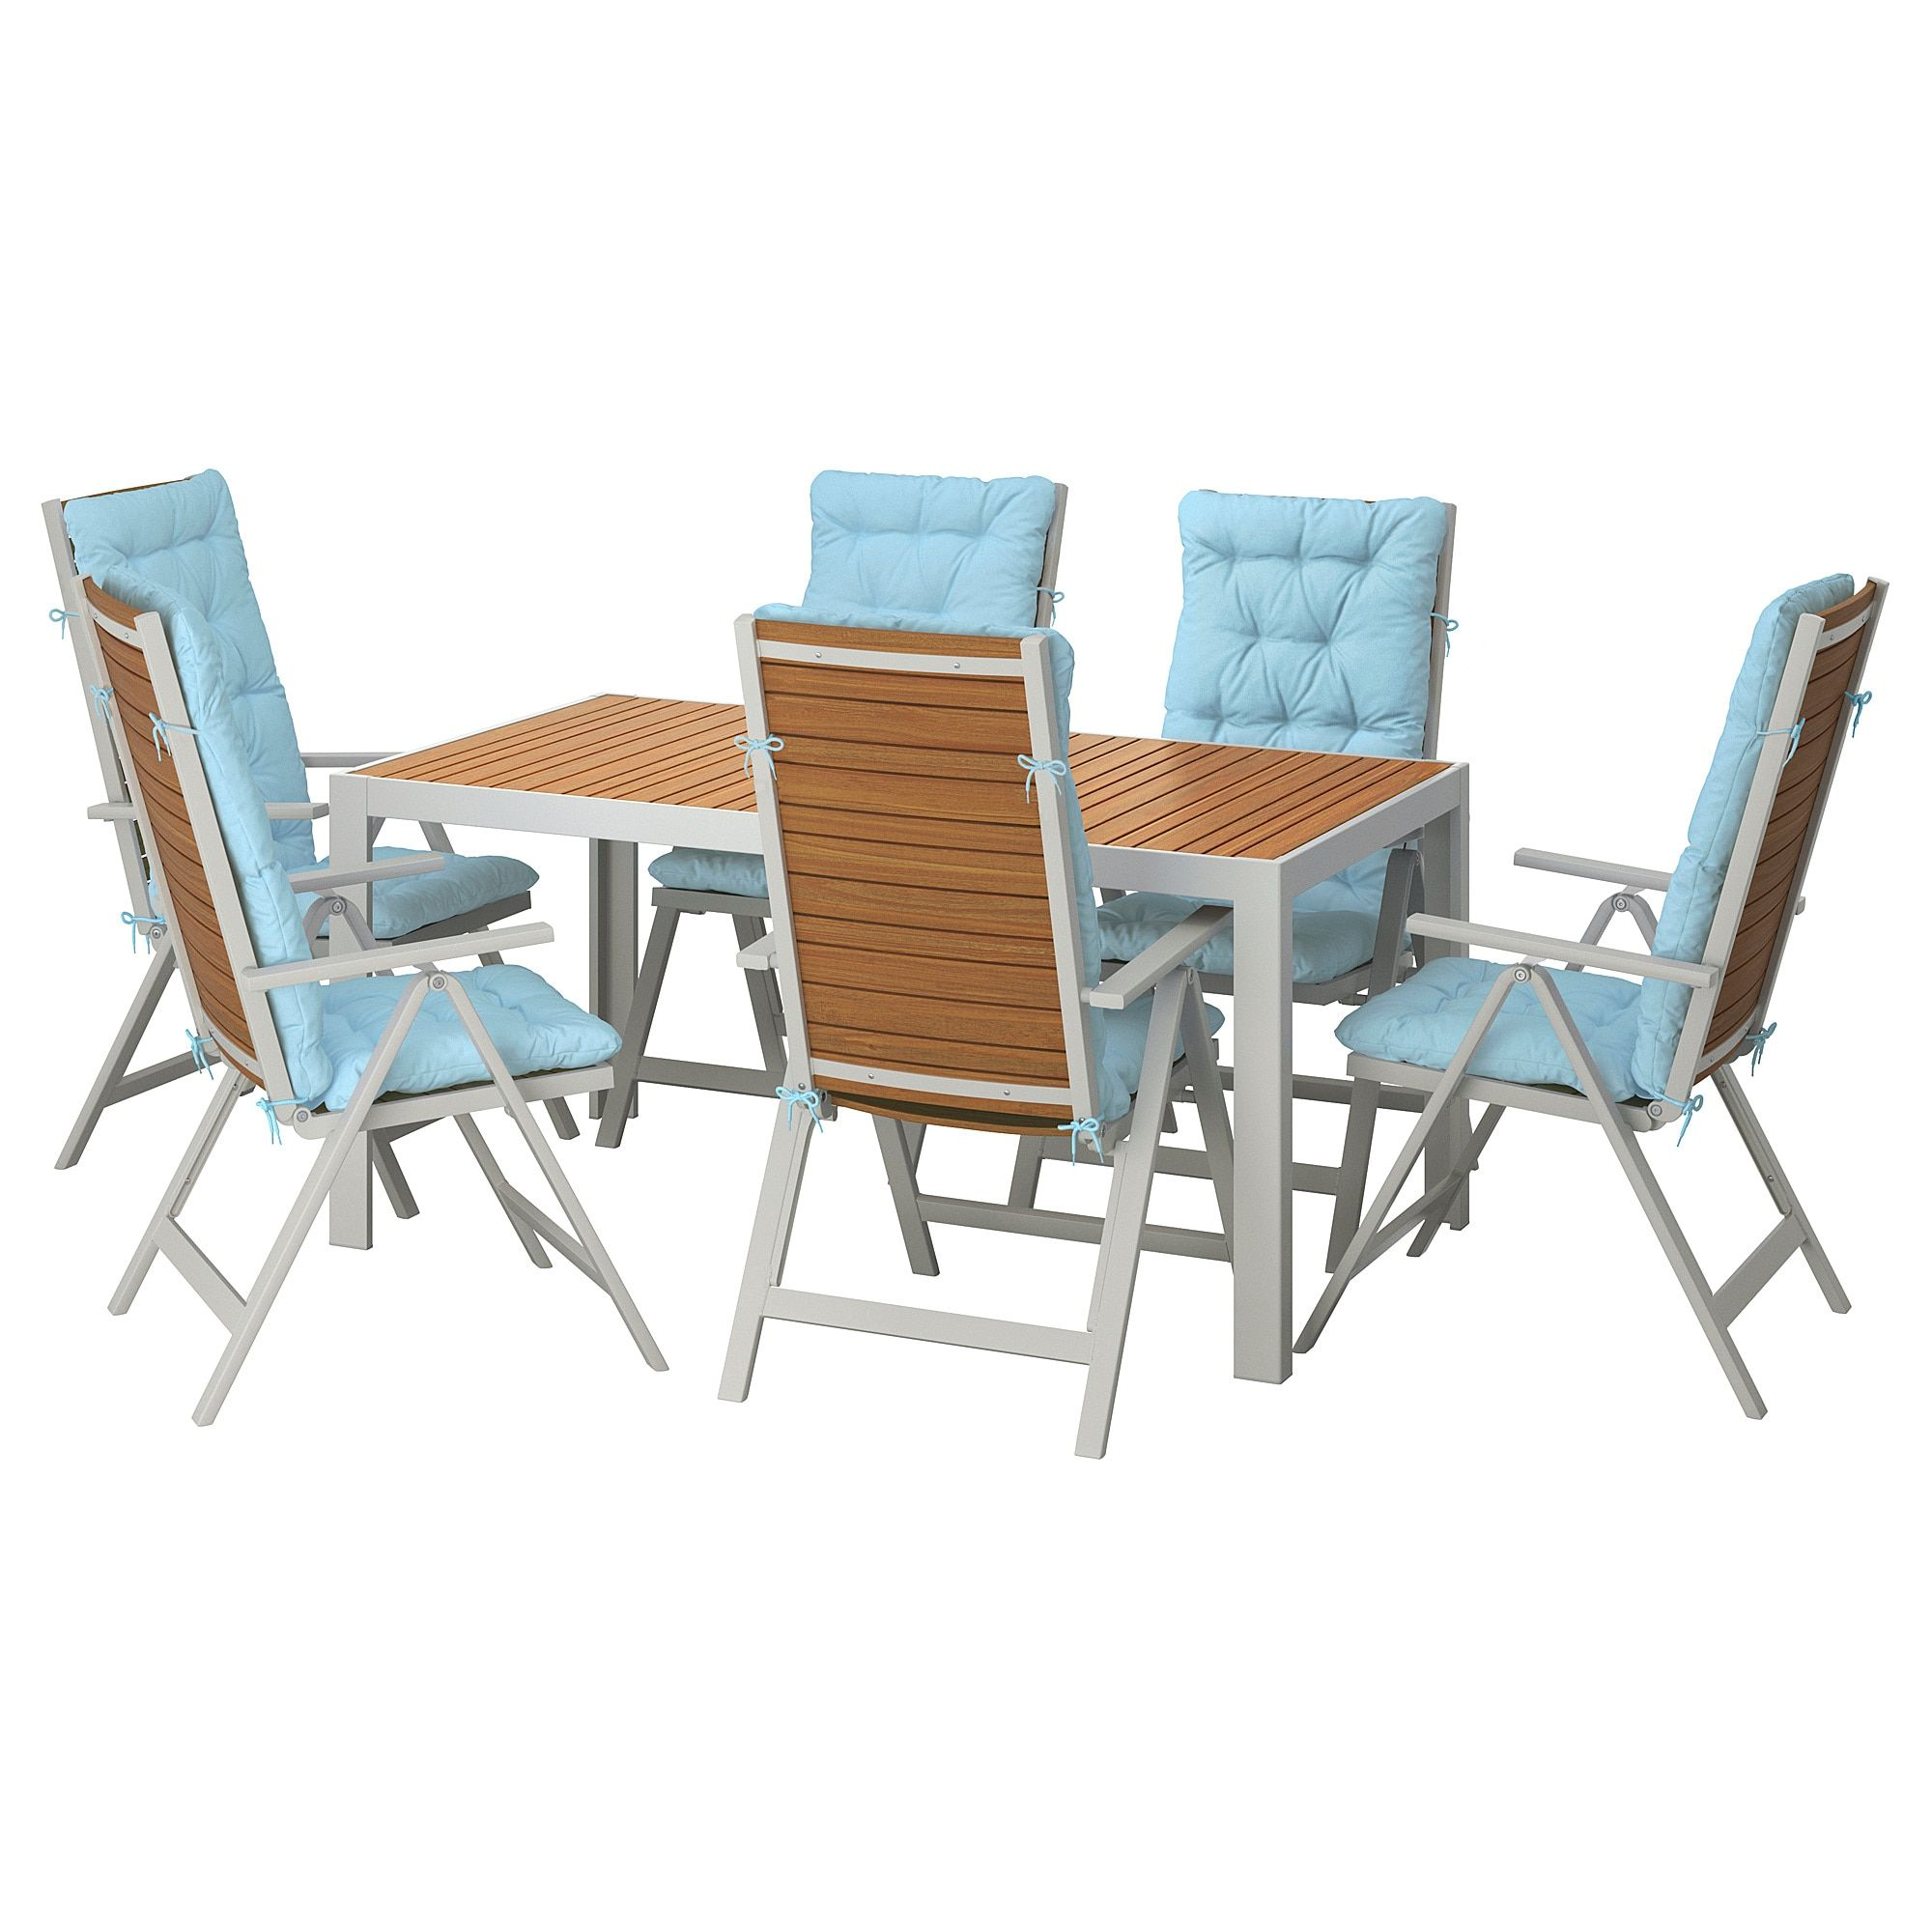 Wondrous Sjalland Table 6 Reclining Chairs Outdoor Light Brown Unemploymentrelief Wooden Chair Designs For Living Room Unemploymentrelieforg